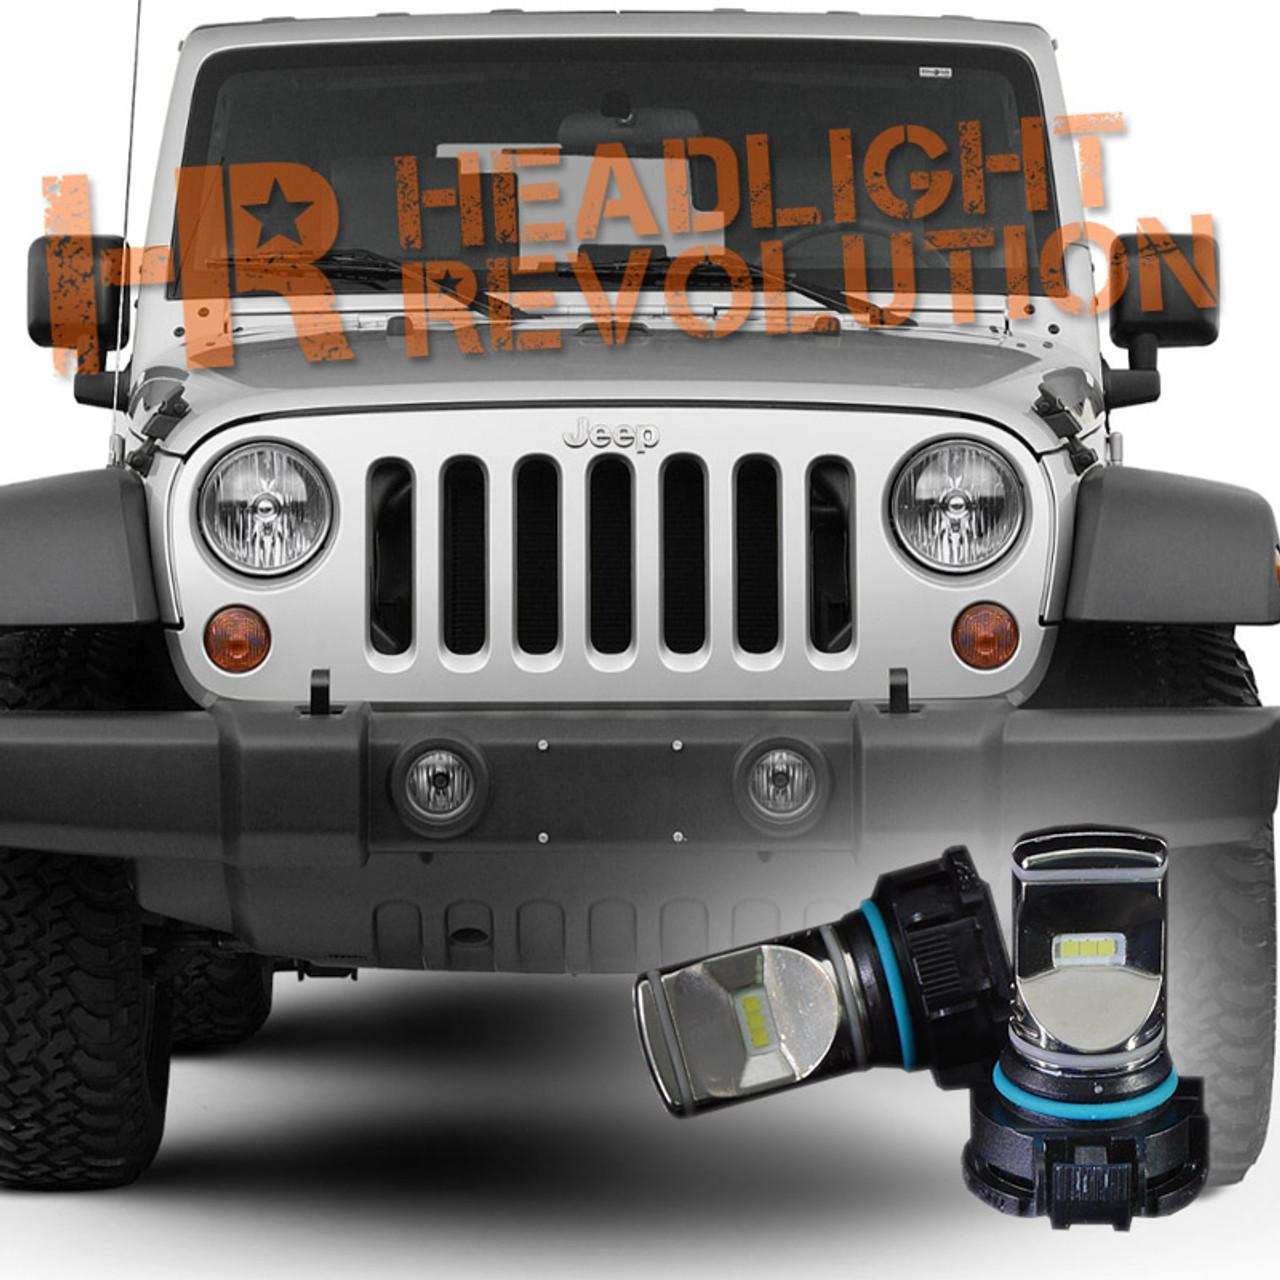 small resolution of wiring diagram also evo jeep jk front bumper lights on jeep jk fog diagram also evo jeep jk front bumper lights on jeep jk fog light